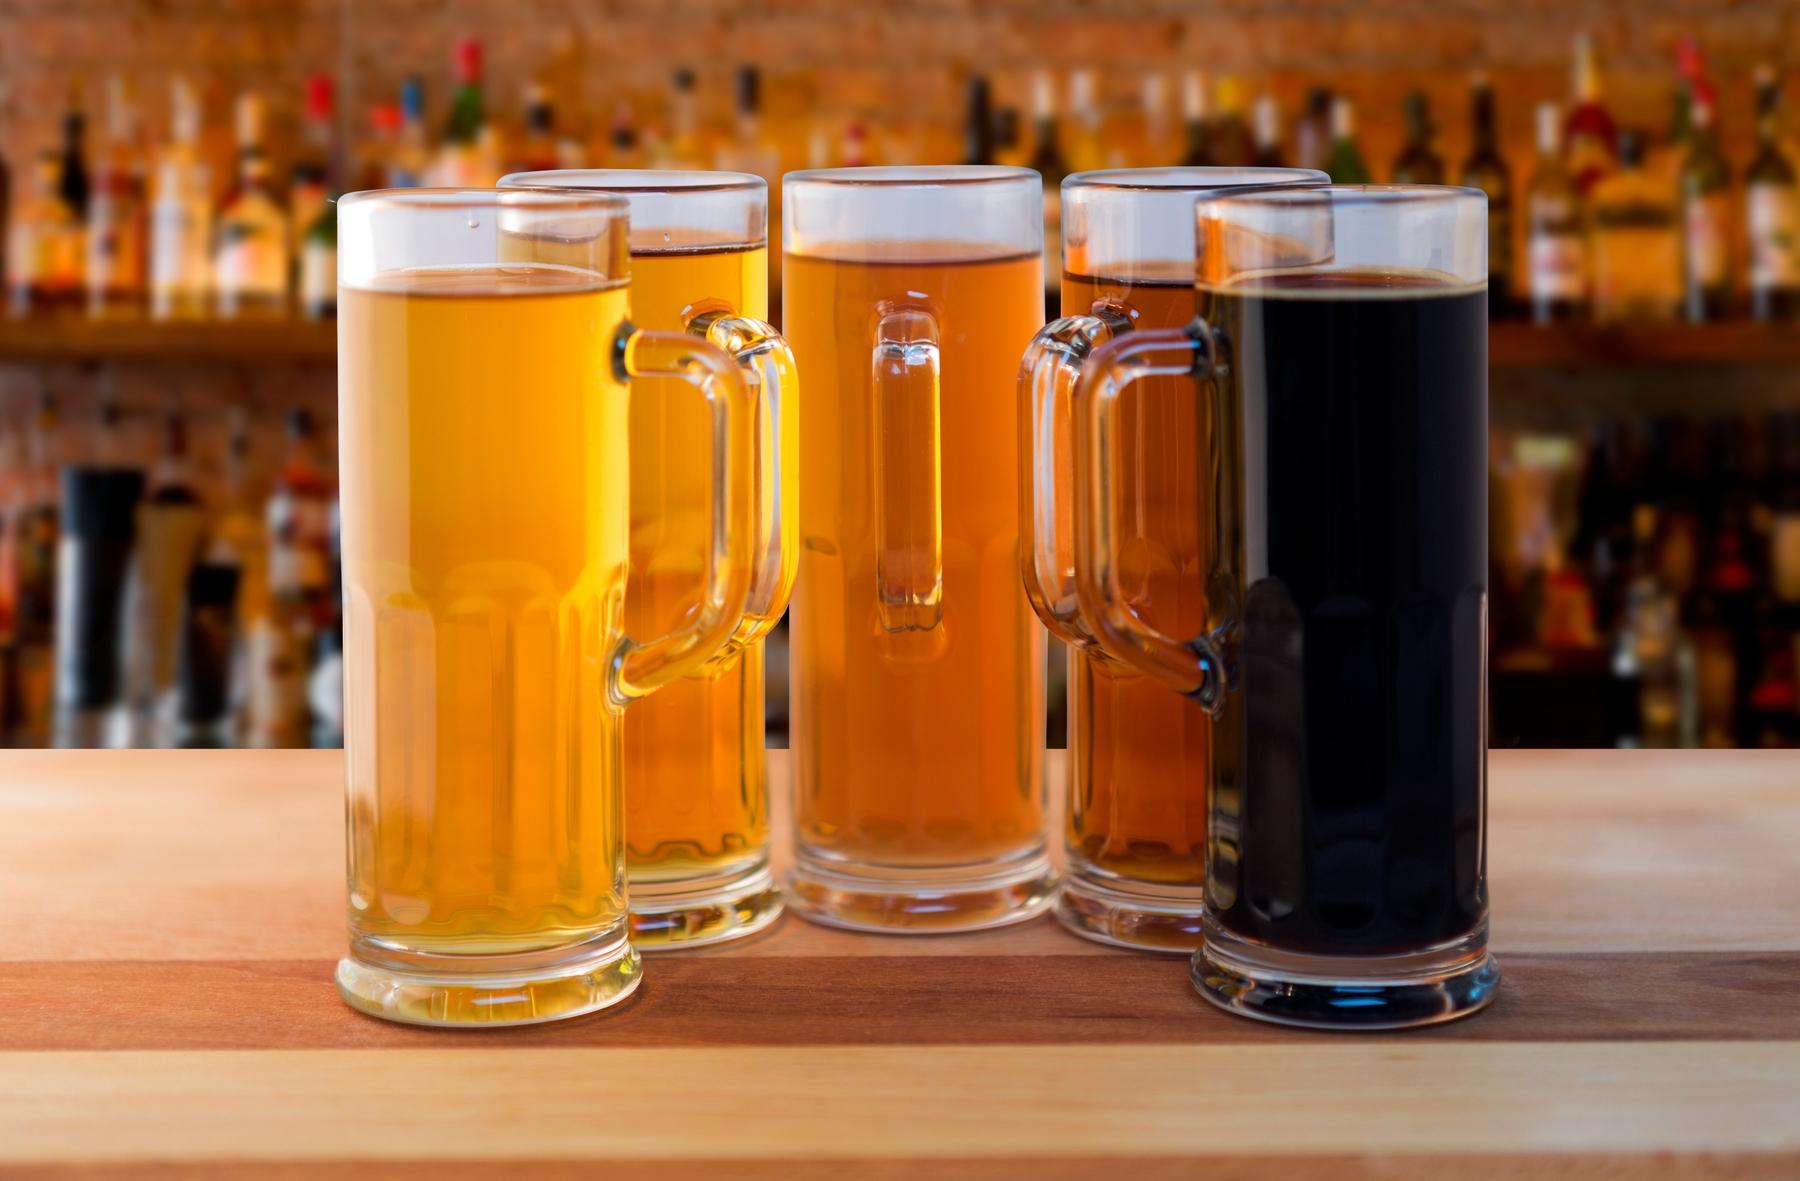 Ramener de la bière de son voyage